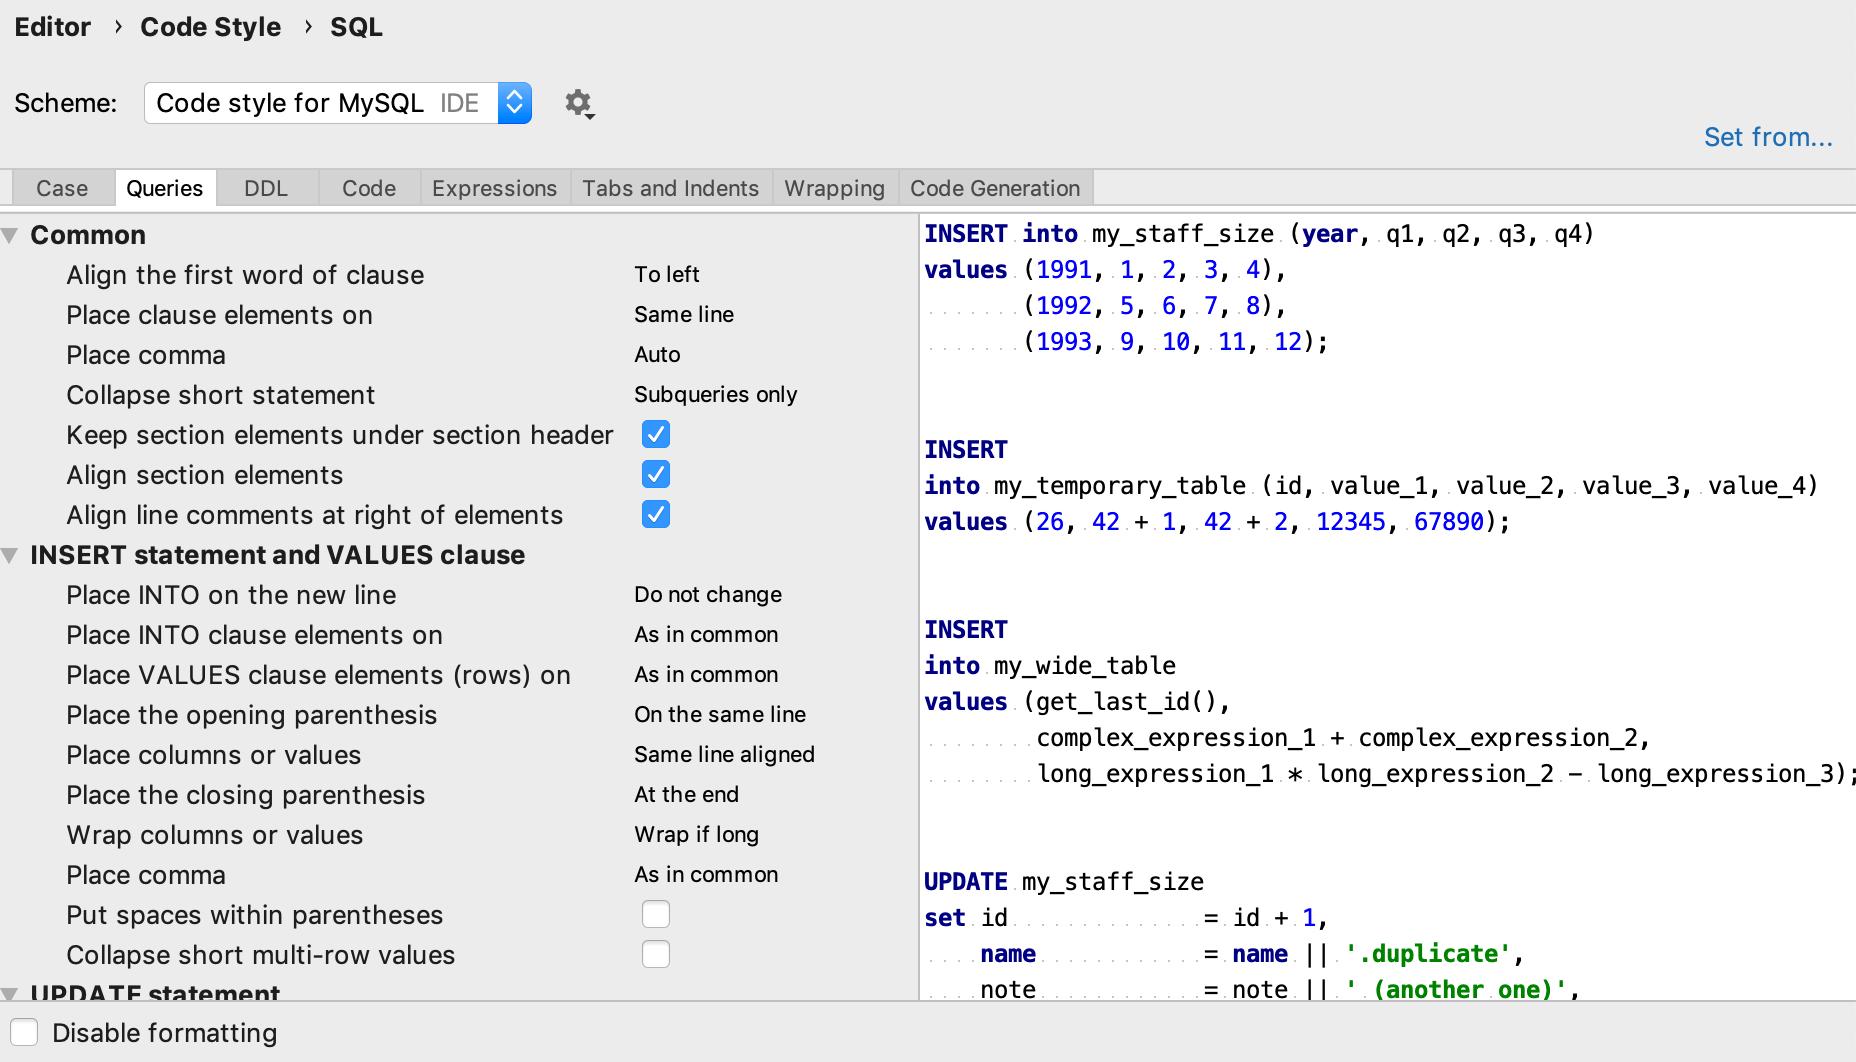 Code style settings